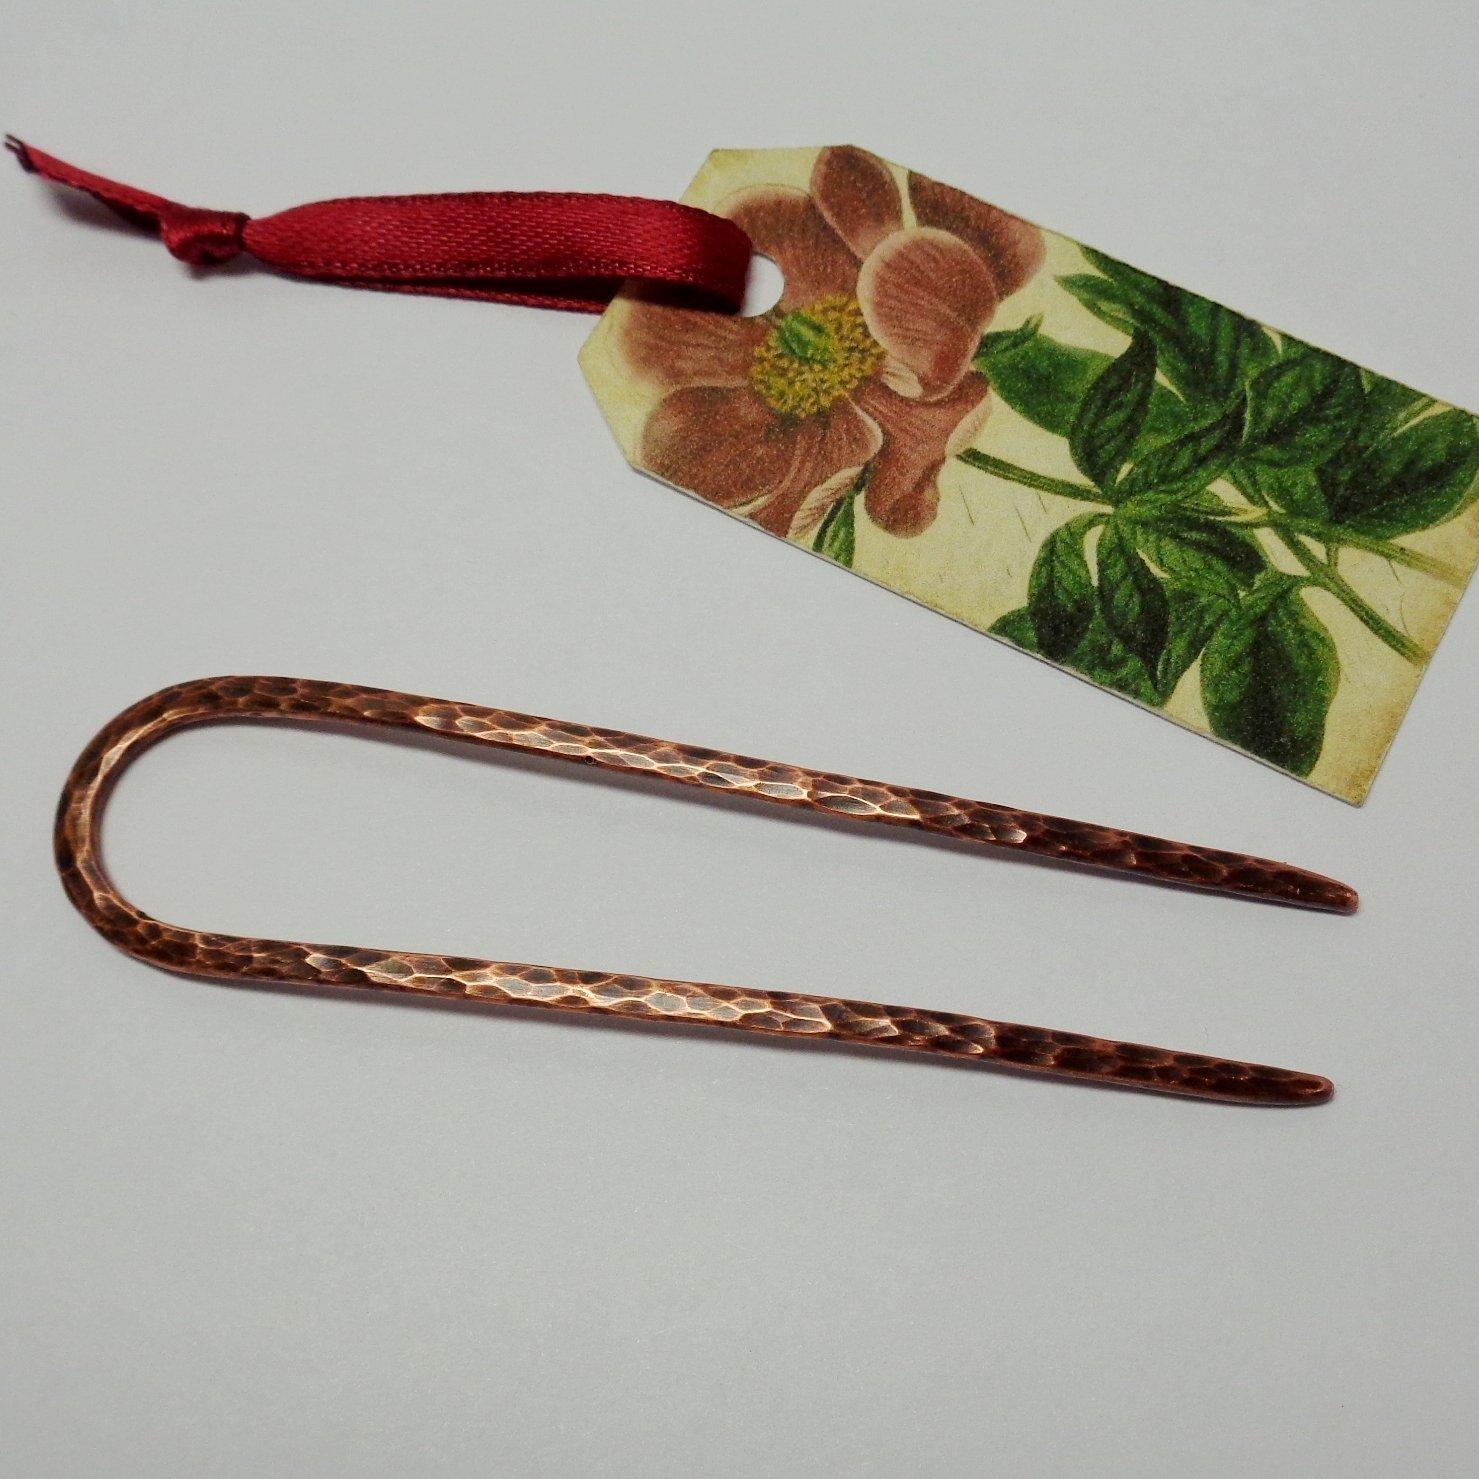 1 Metal Hair Pin for Long Hair, U-shape Hammered Copper Hair Fork, Custom Length, Handmade Boho Style Hair Accessories